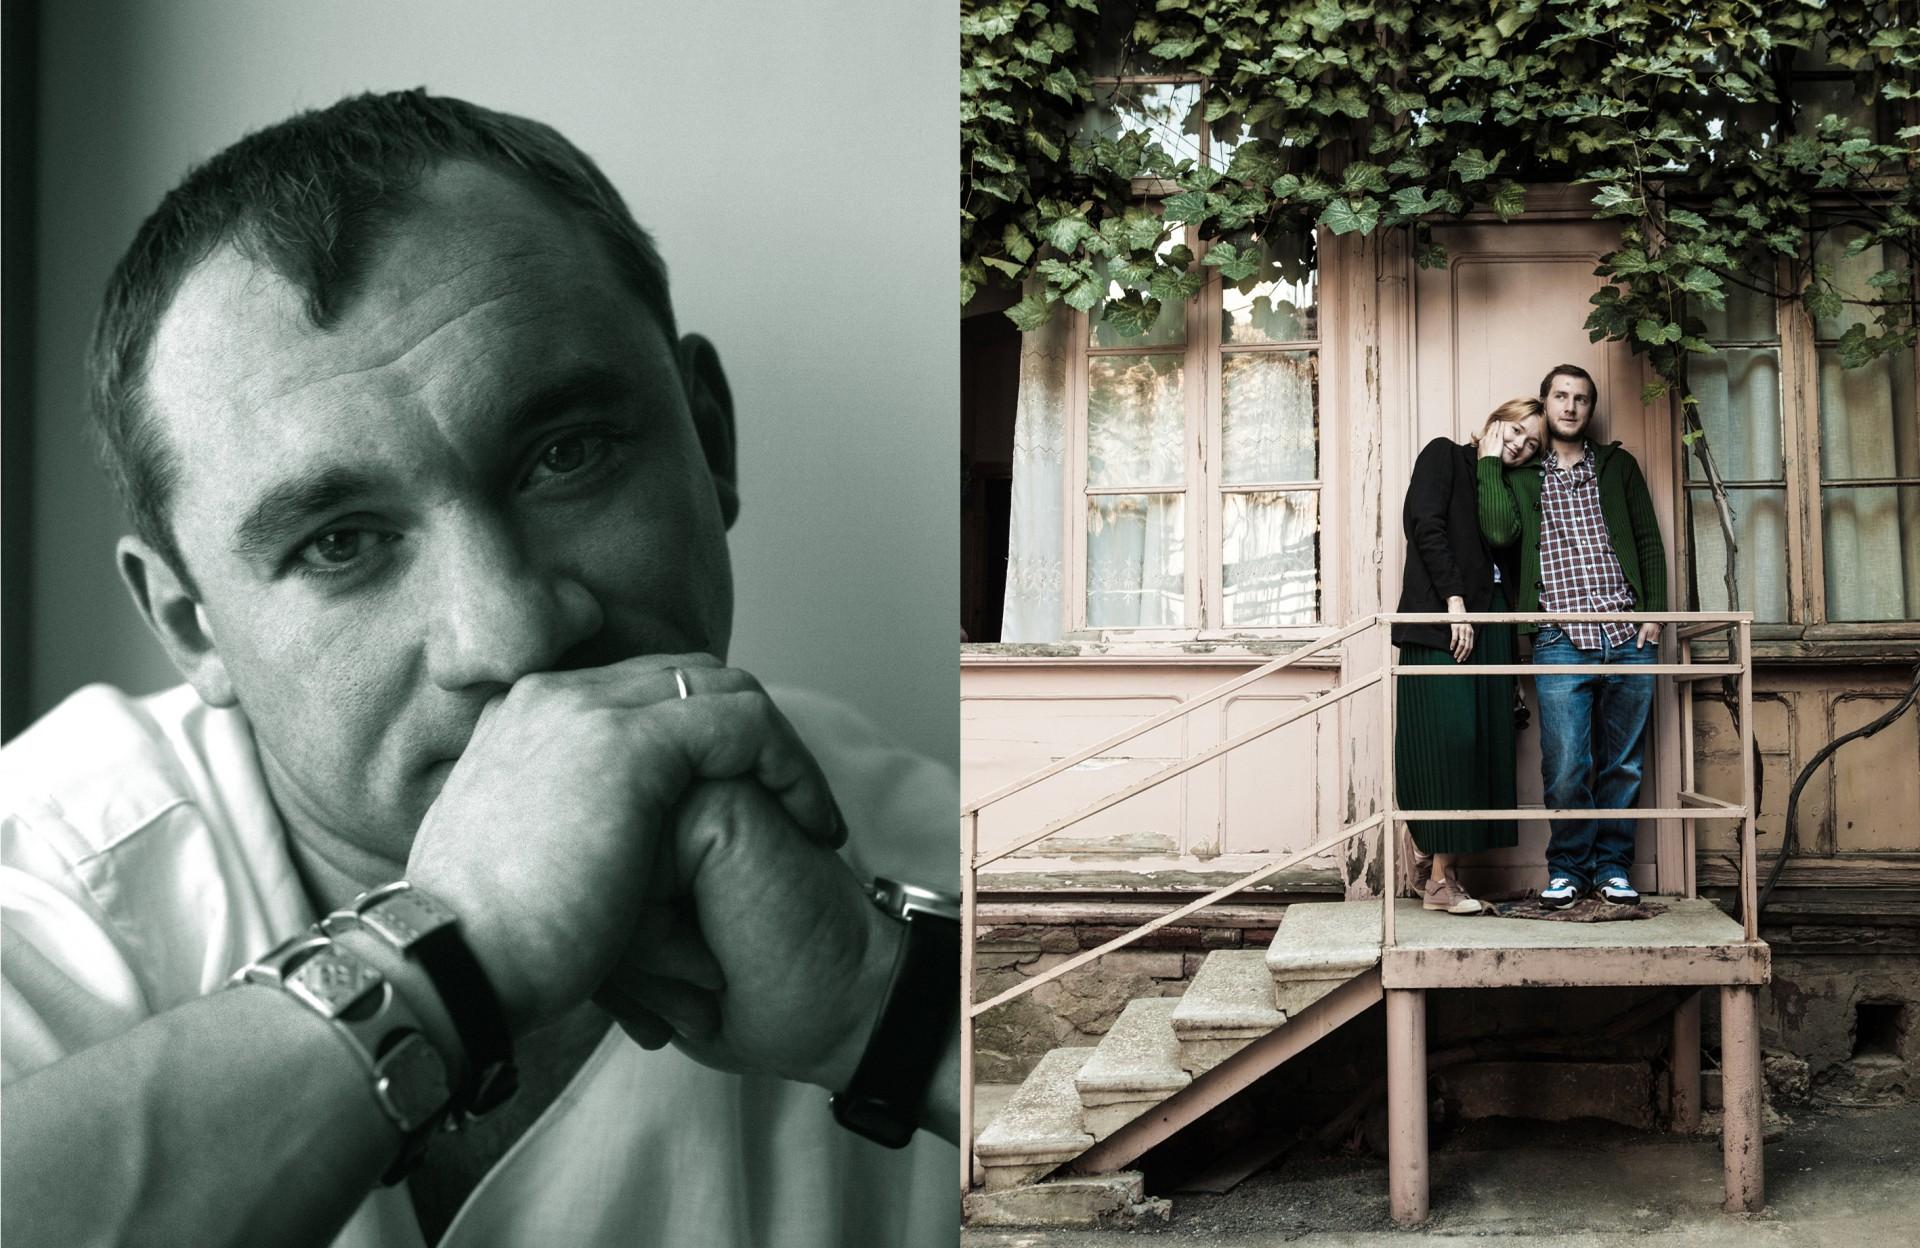 Николай Фоменко , 2005 // Надя Михалкова-Резо Гигинешвили , 2011